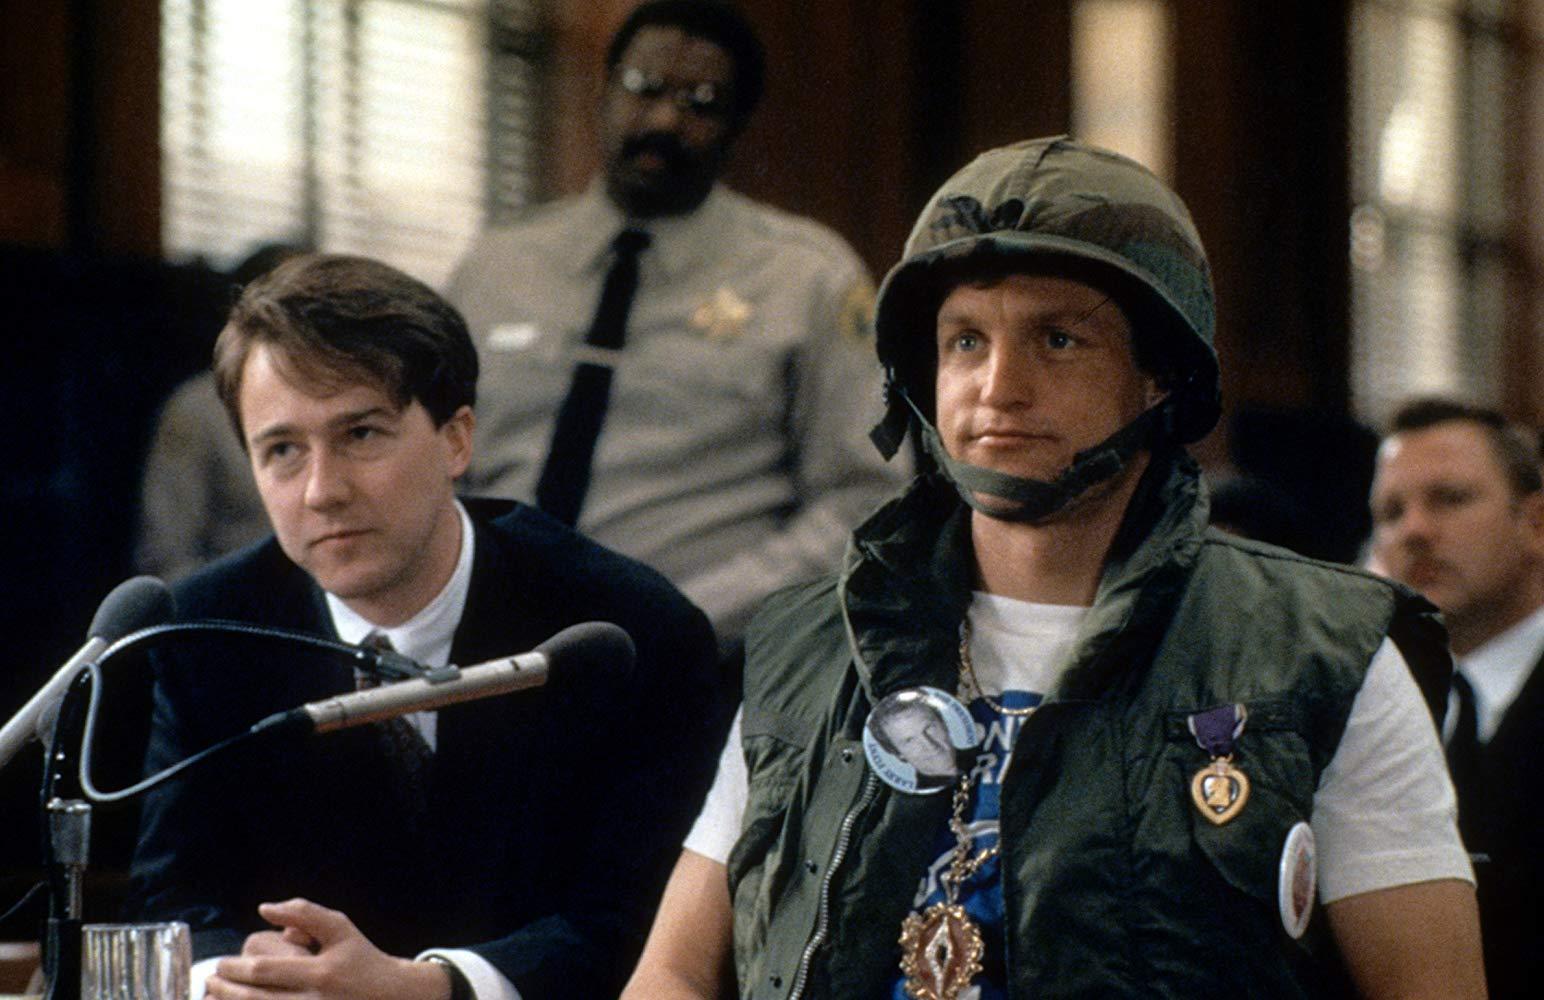 Народ против Ларри Флинта (The People vs. Larry Flynt) 1996